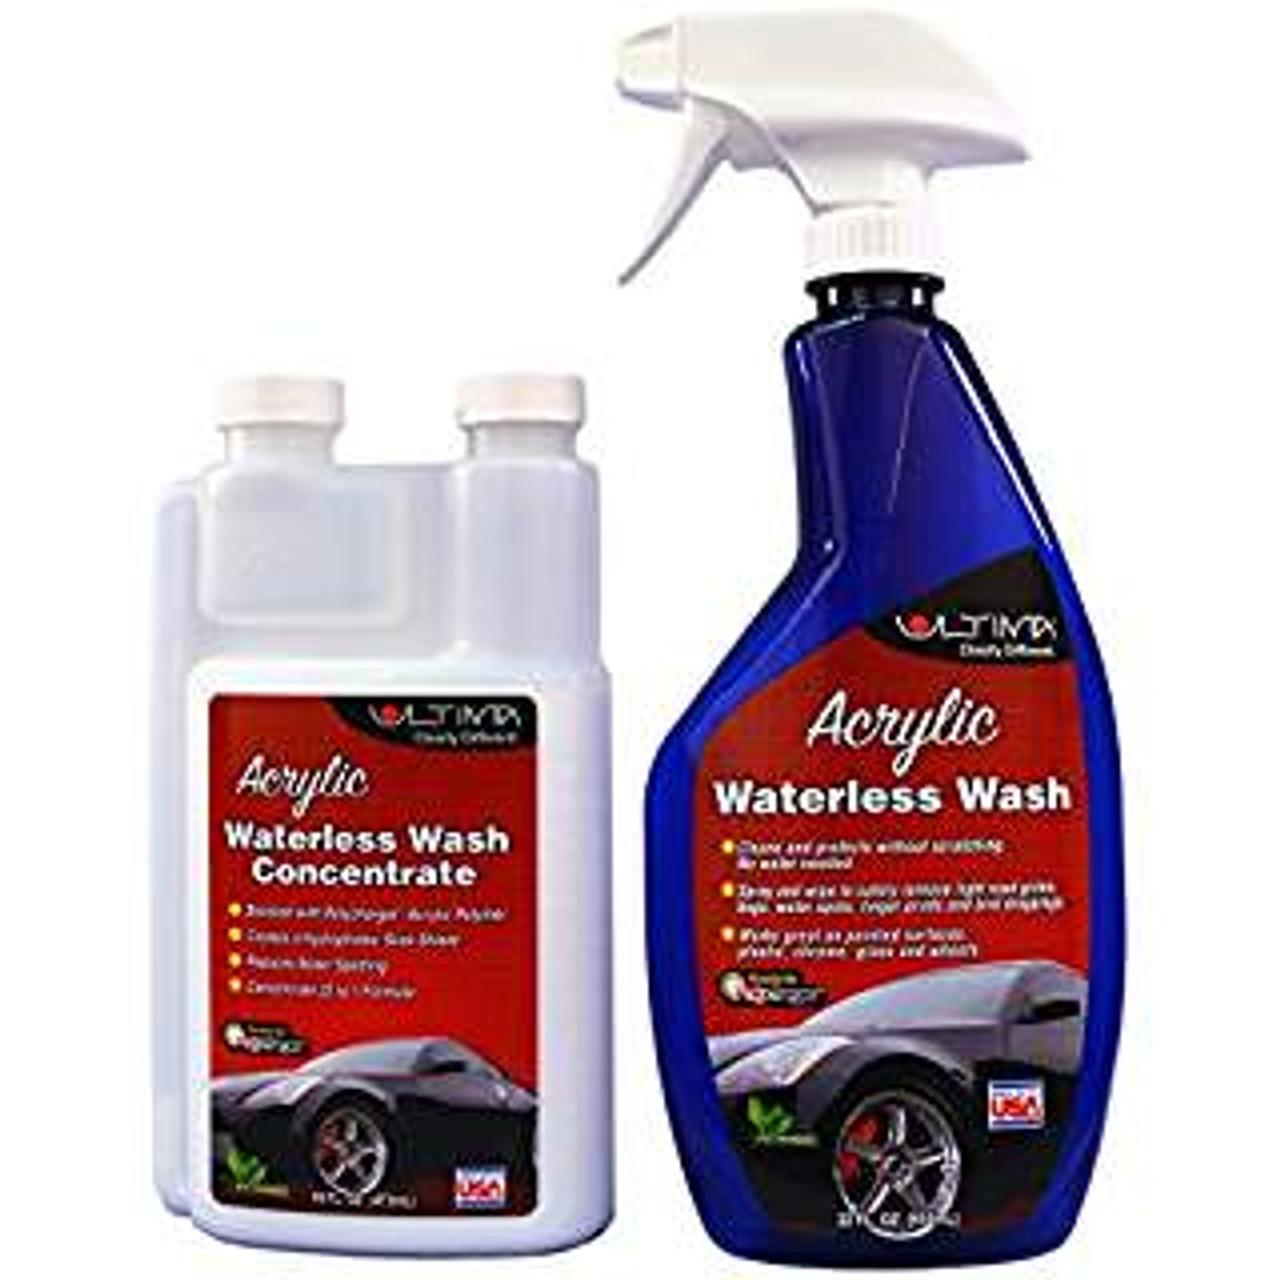 Ultima Acrylic Waterless Wash Concentrate 16 Oz Bundle W Bottle